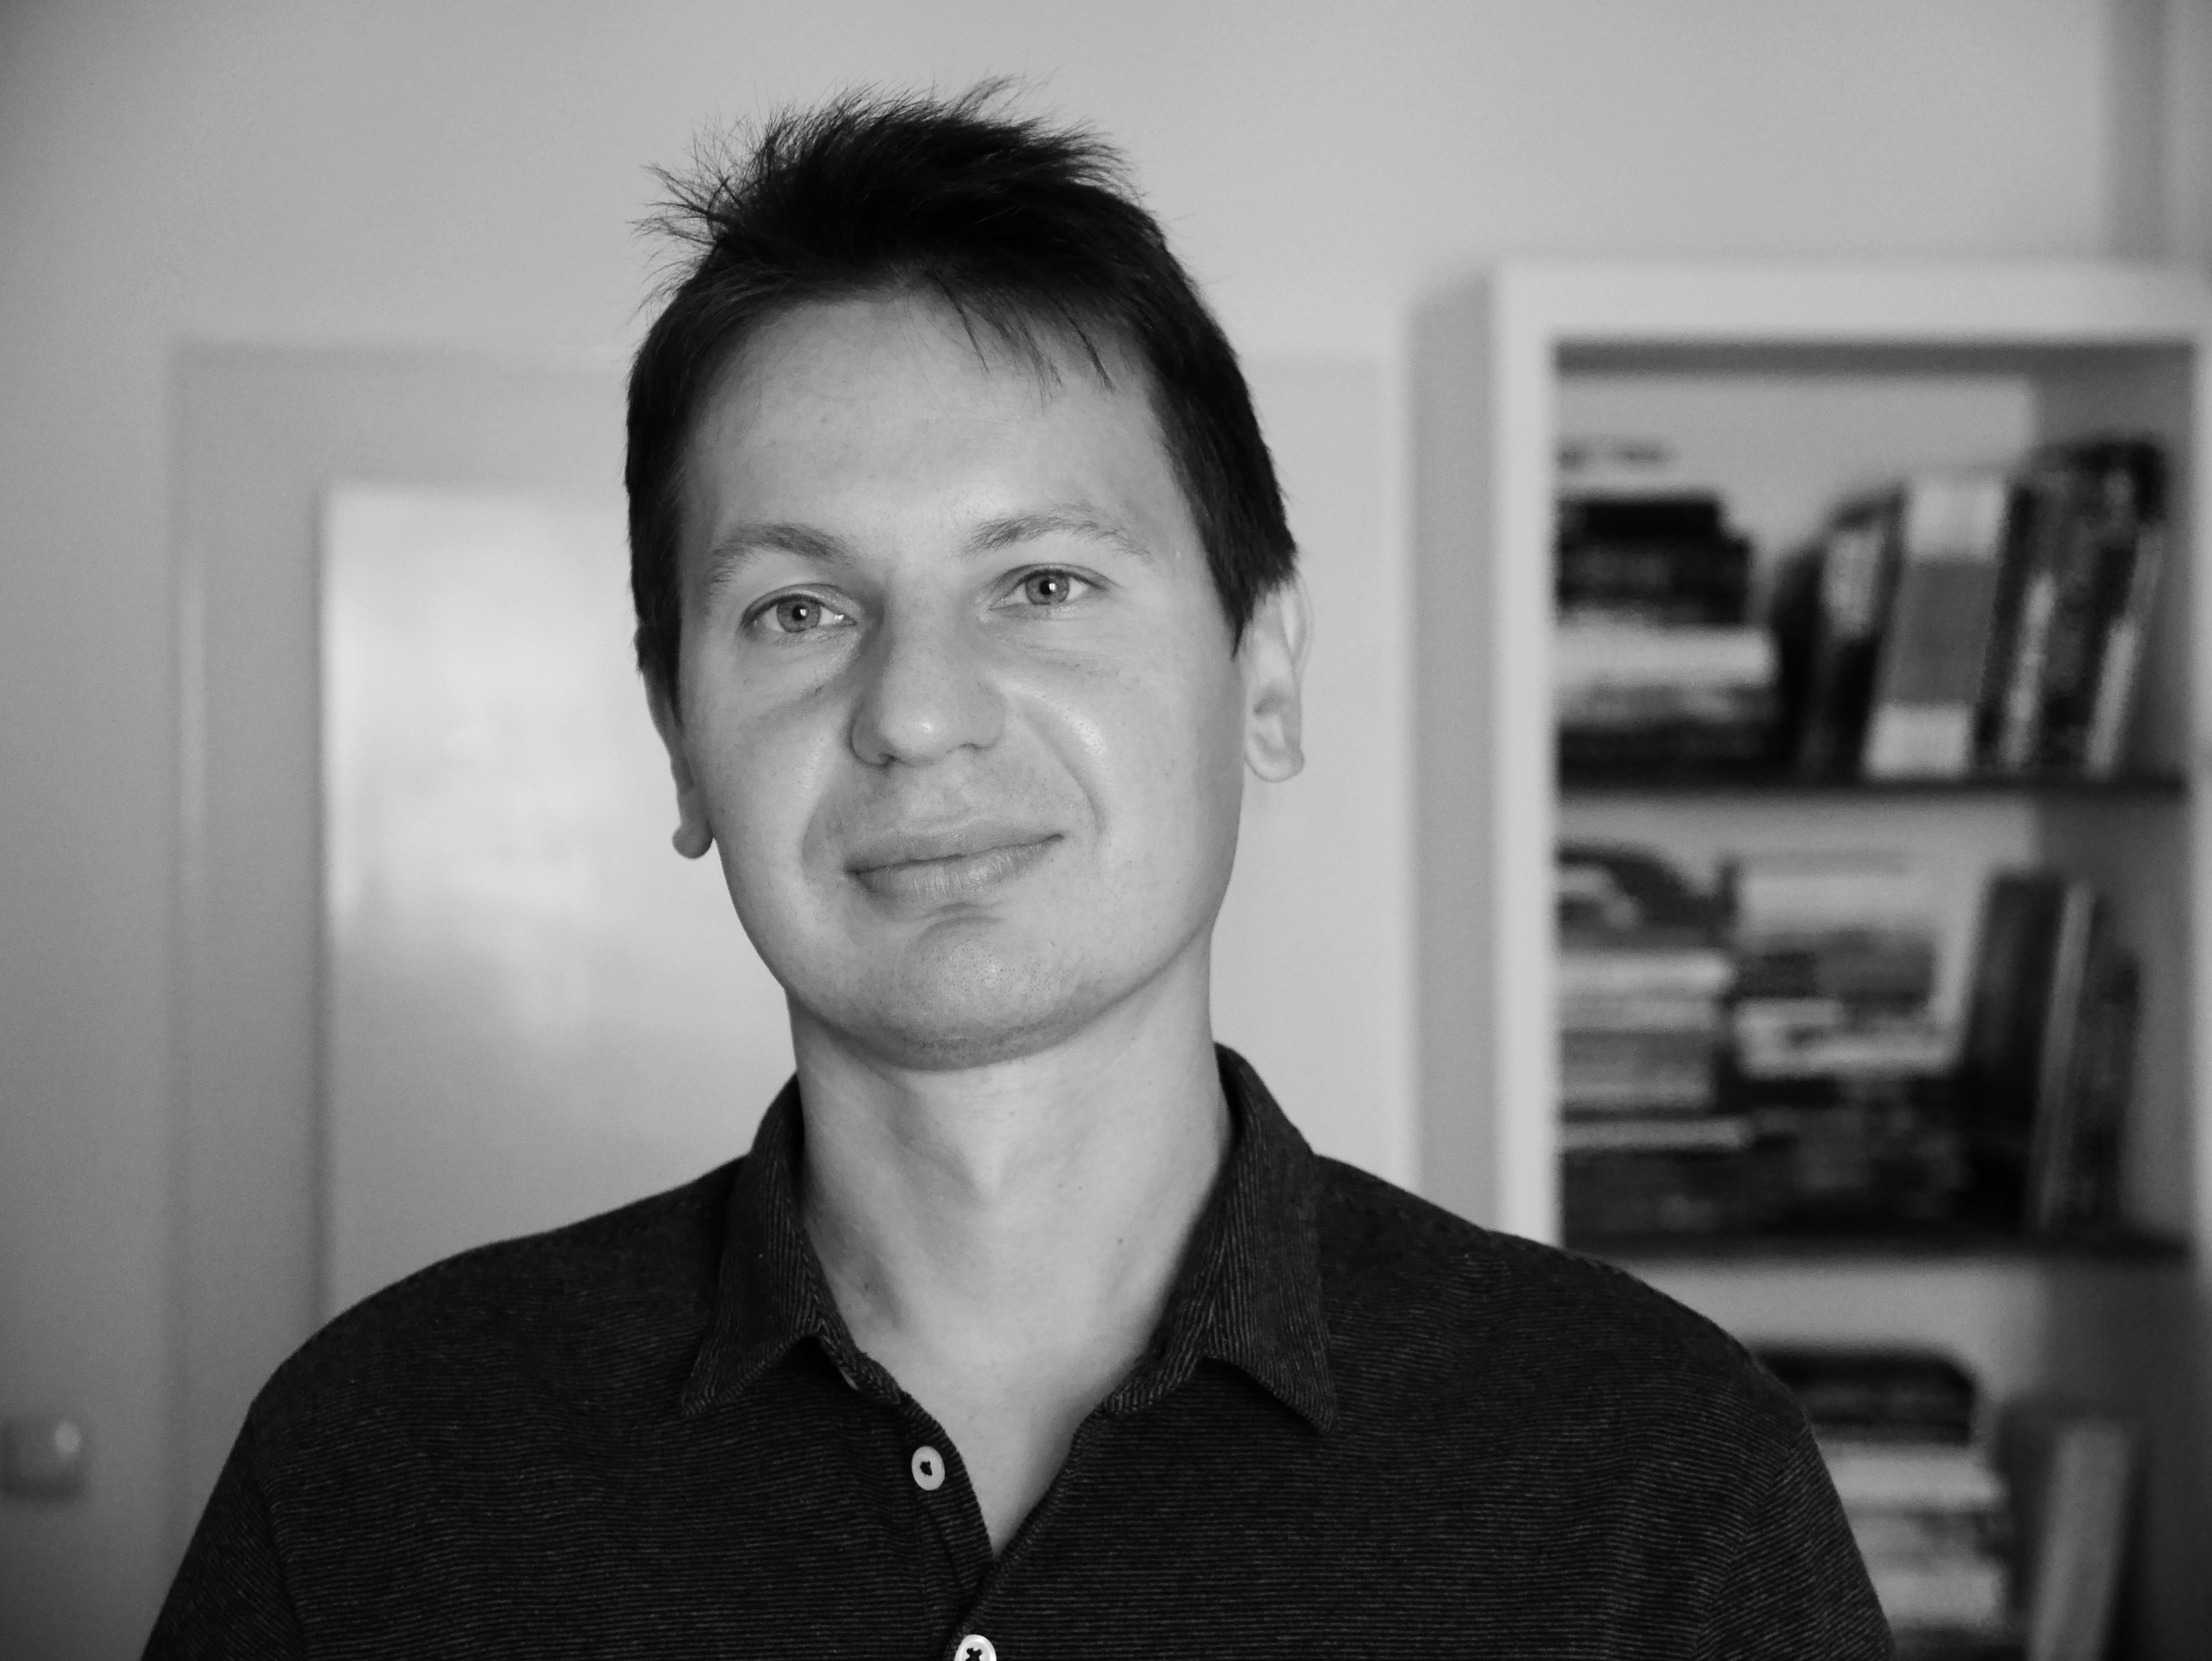 Peter Kocyla